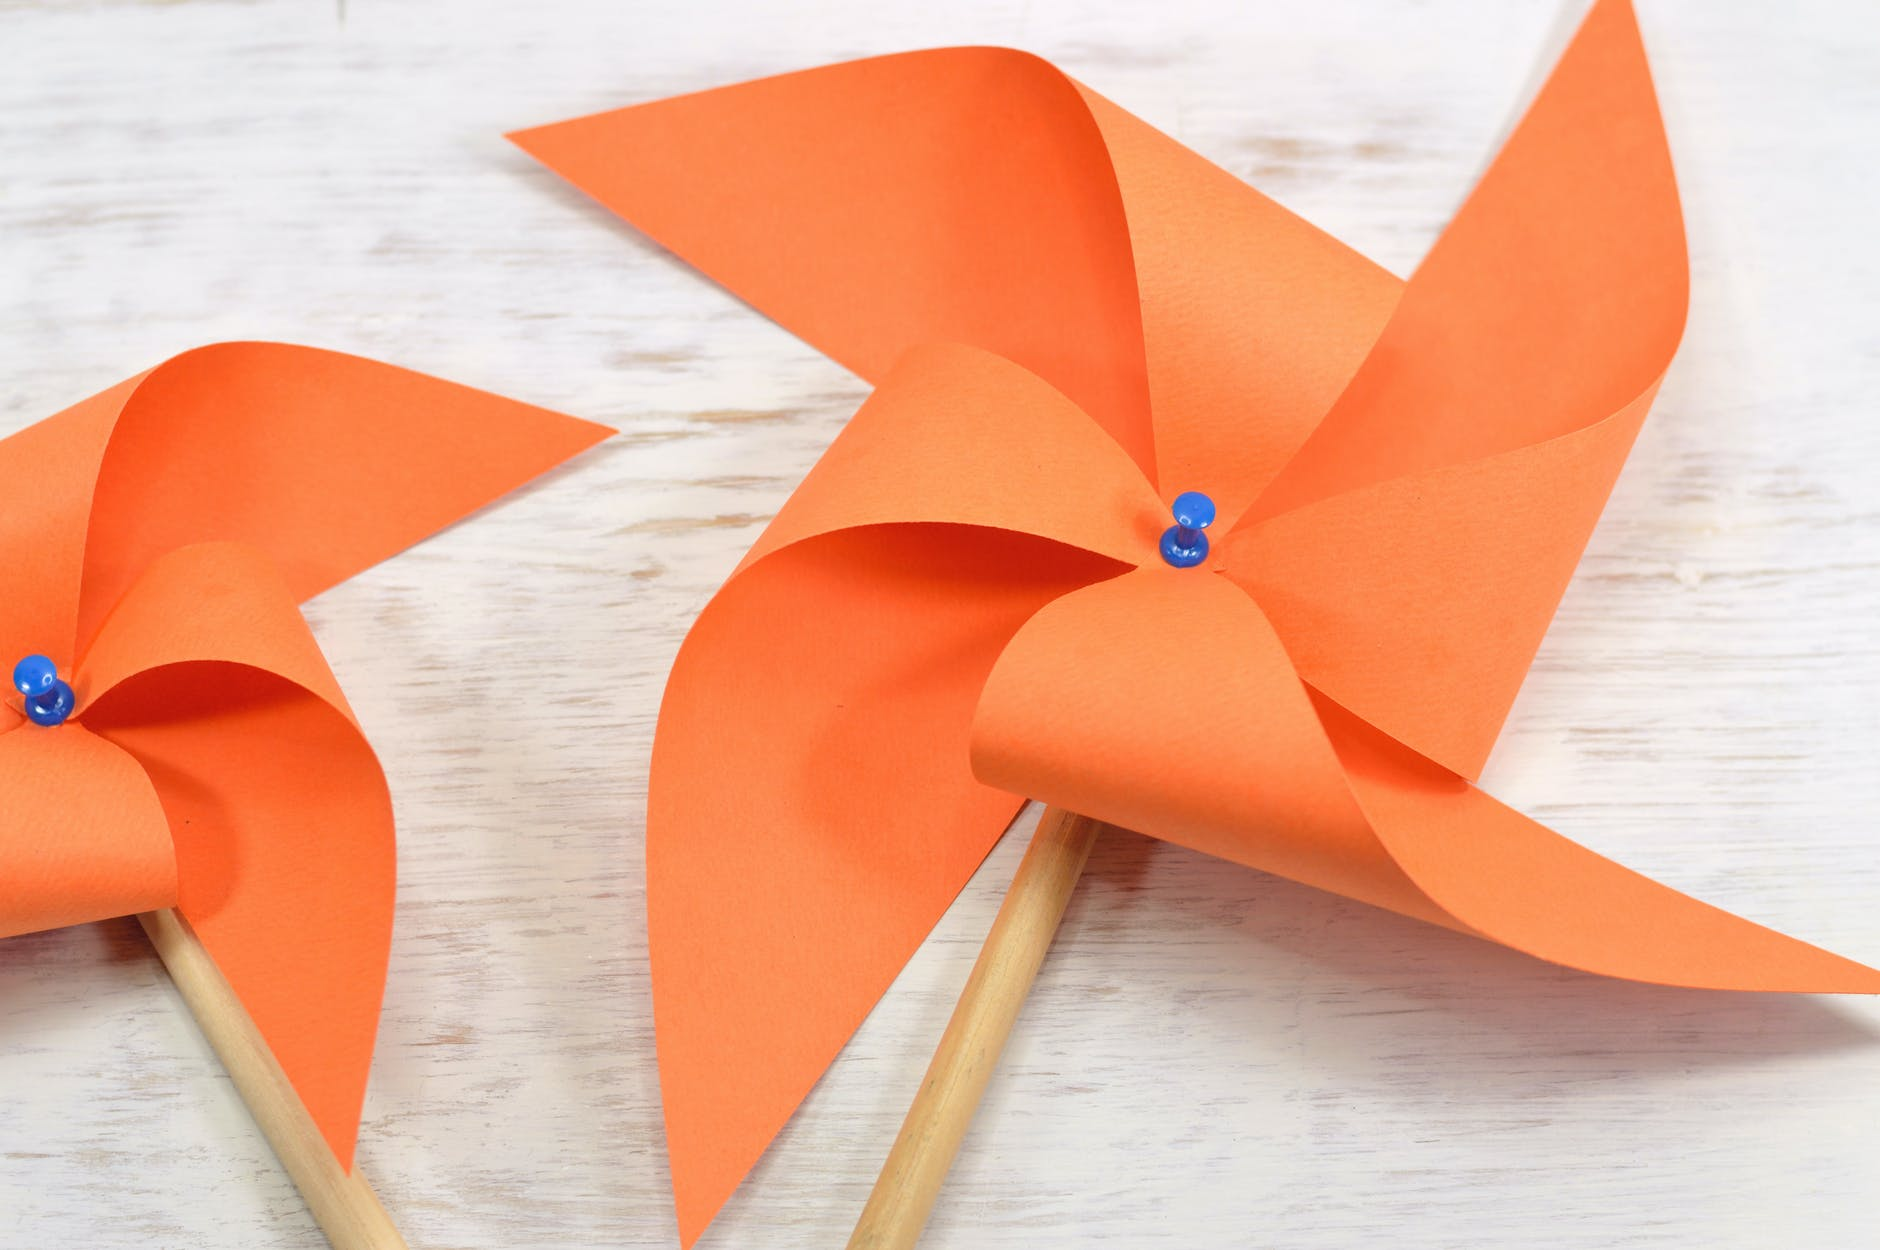 two orange paper windmills